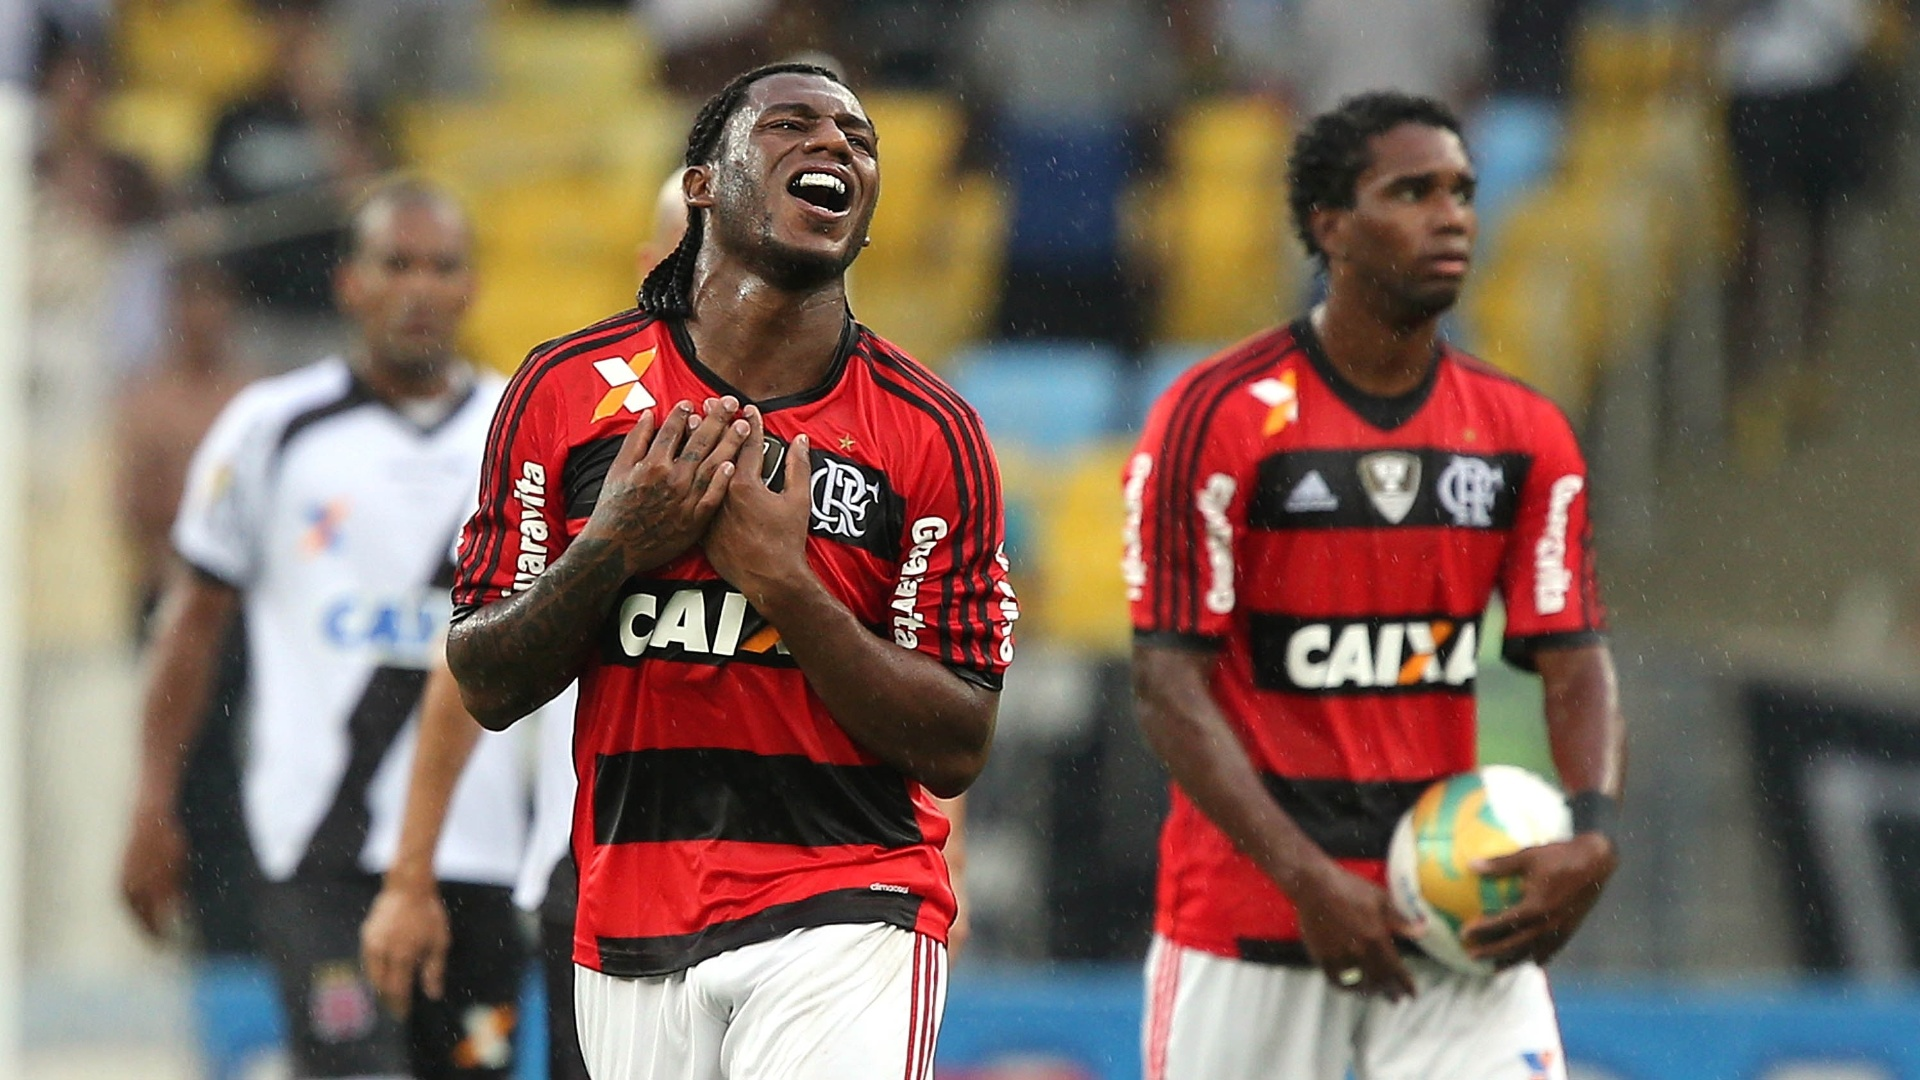 Amaral lamenta chance perdida pelo Flamengo no Maracnaã